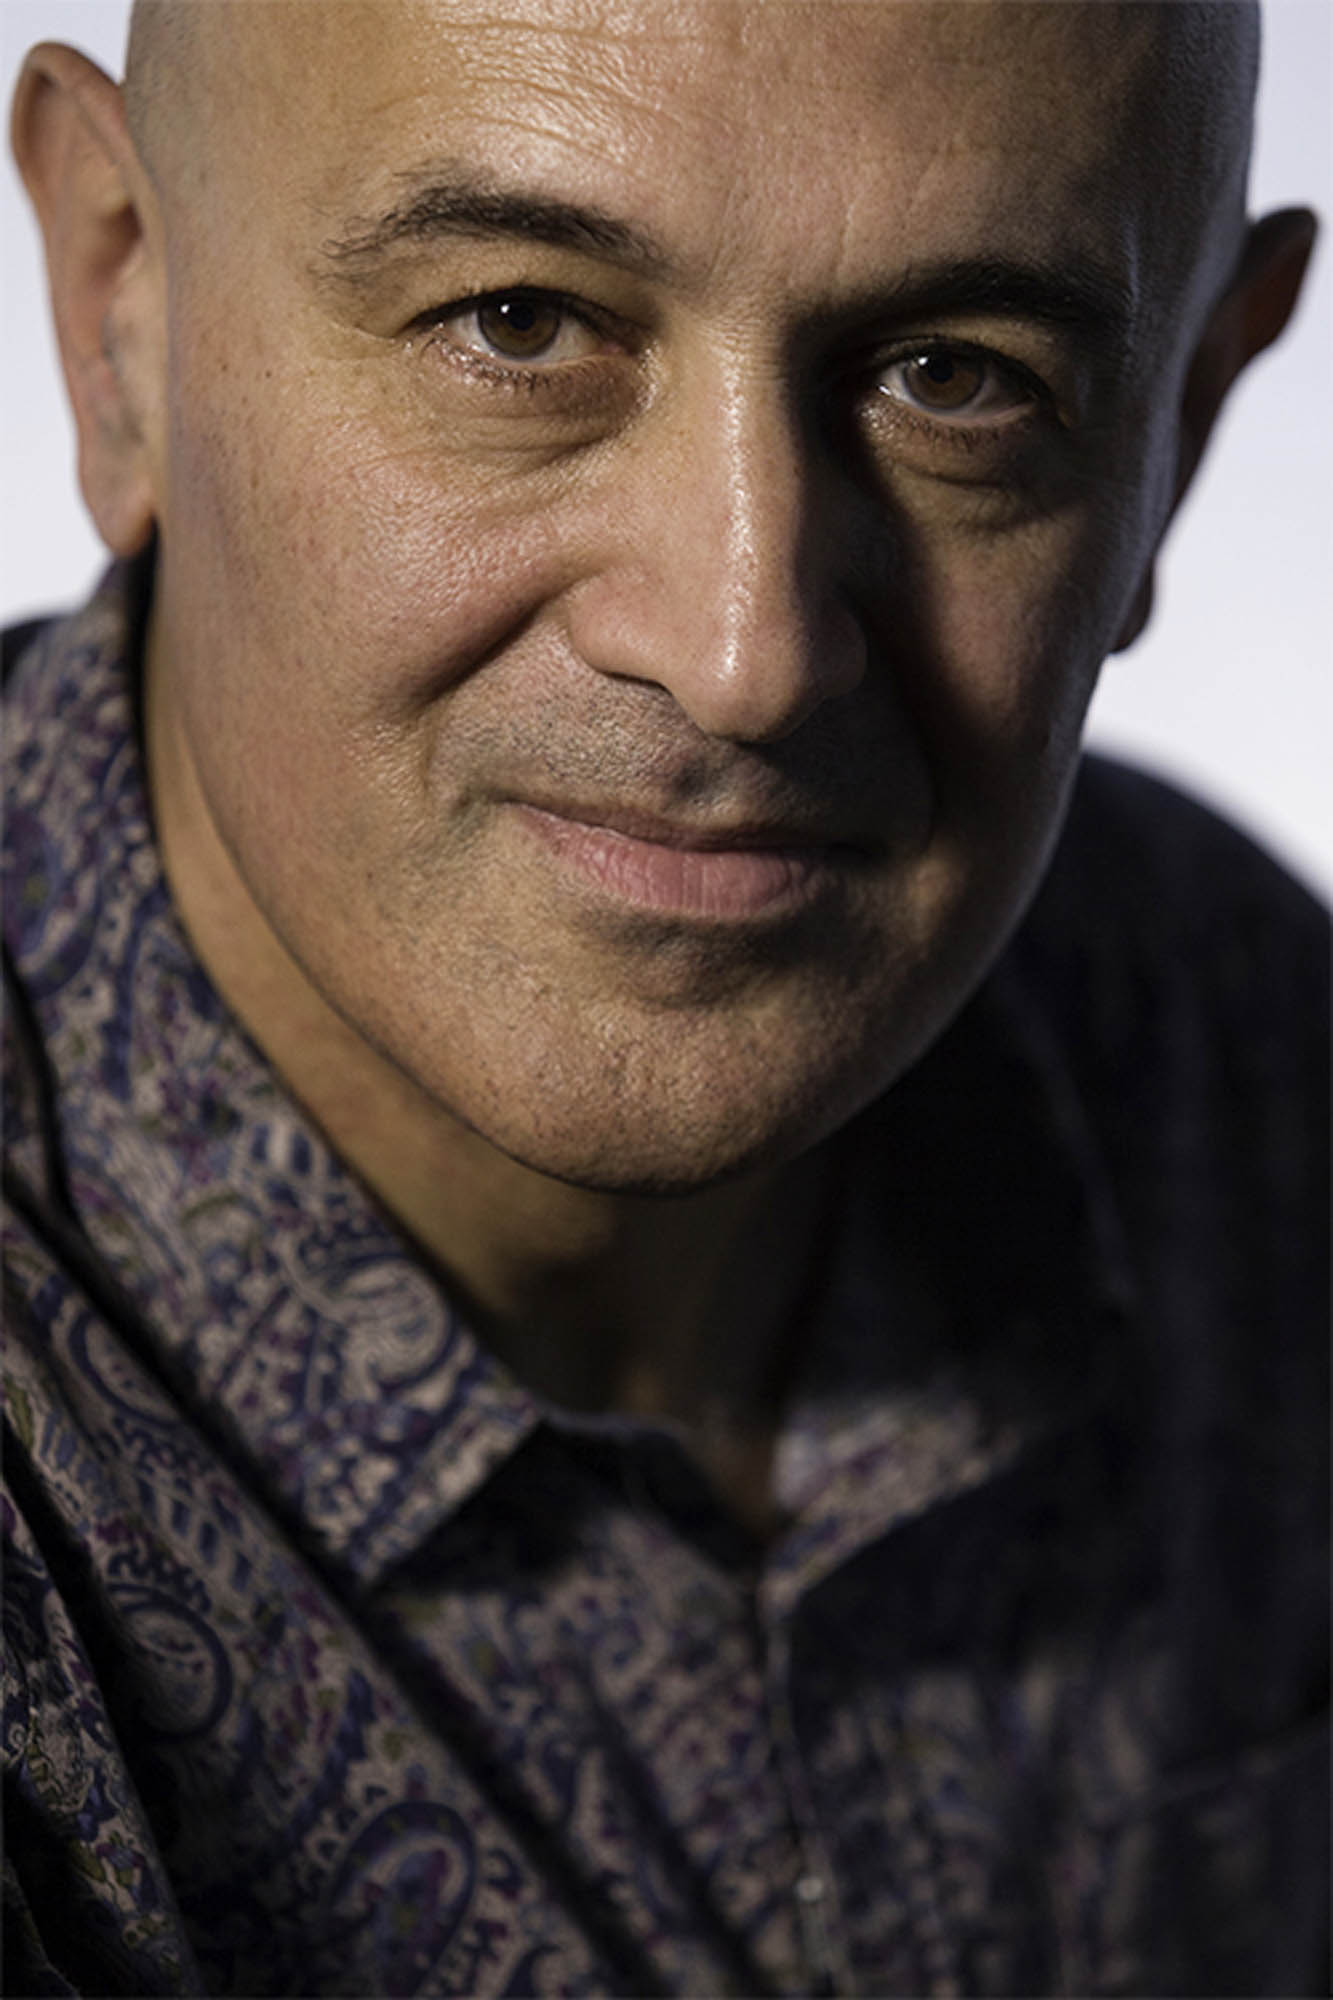 Jim Al Khalilli Chris Boardman Portrait © Nick Gregan Photographer